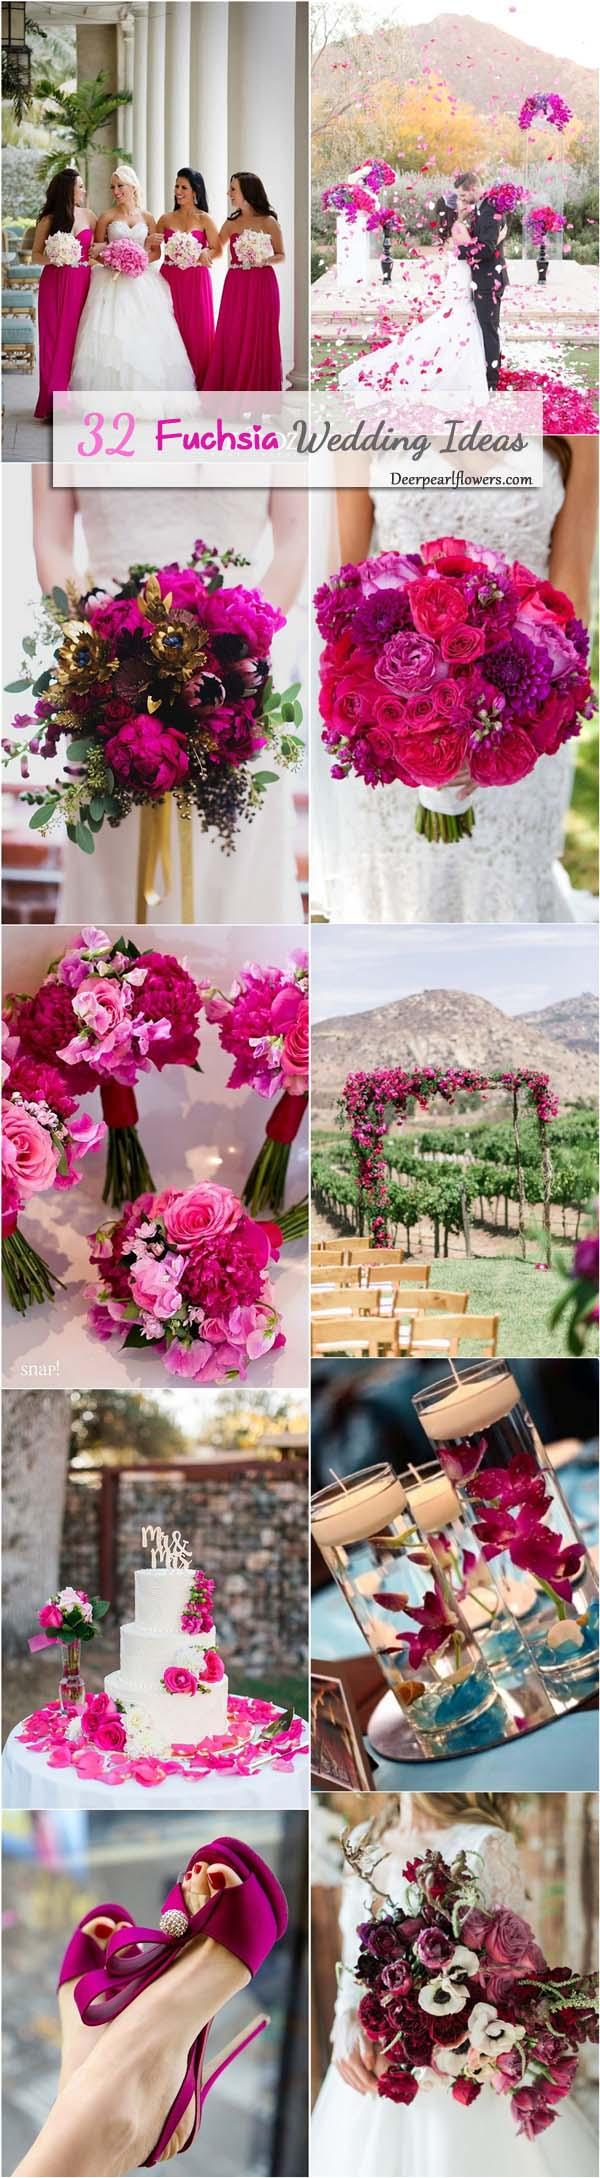 Cheap Wedding Favors Ebay